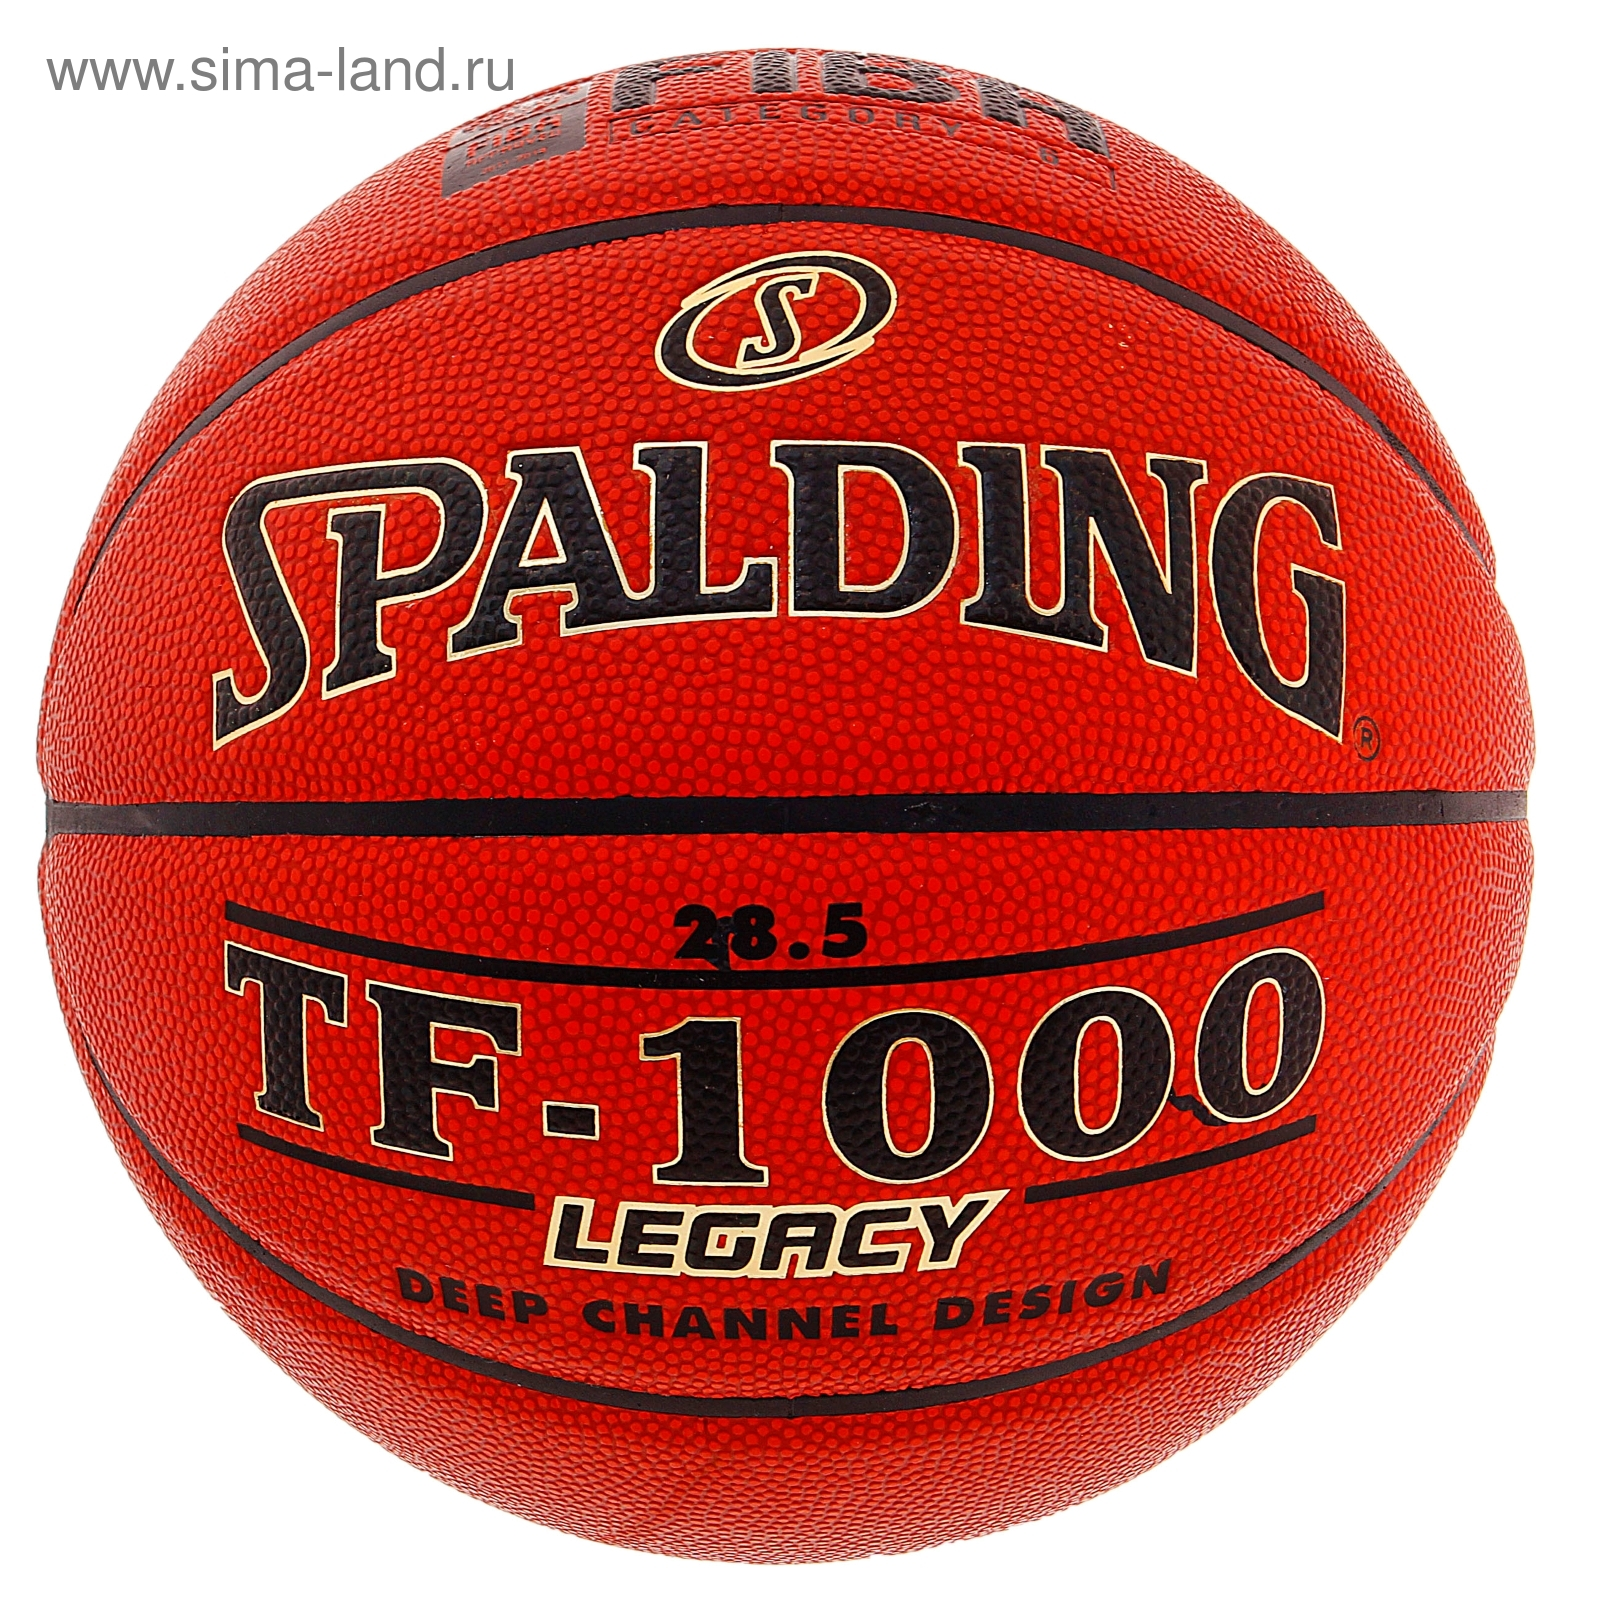 7545e76b Мяч баскетбольный Spalding TF-1000 Legacy, 74-451z, размер 6 (884196 ...